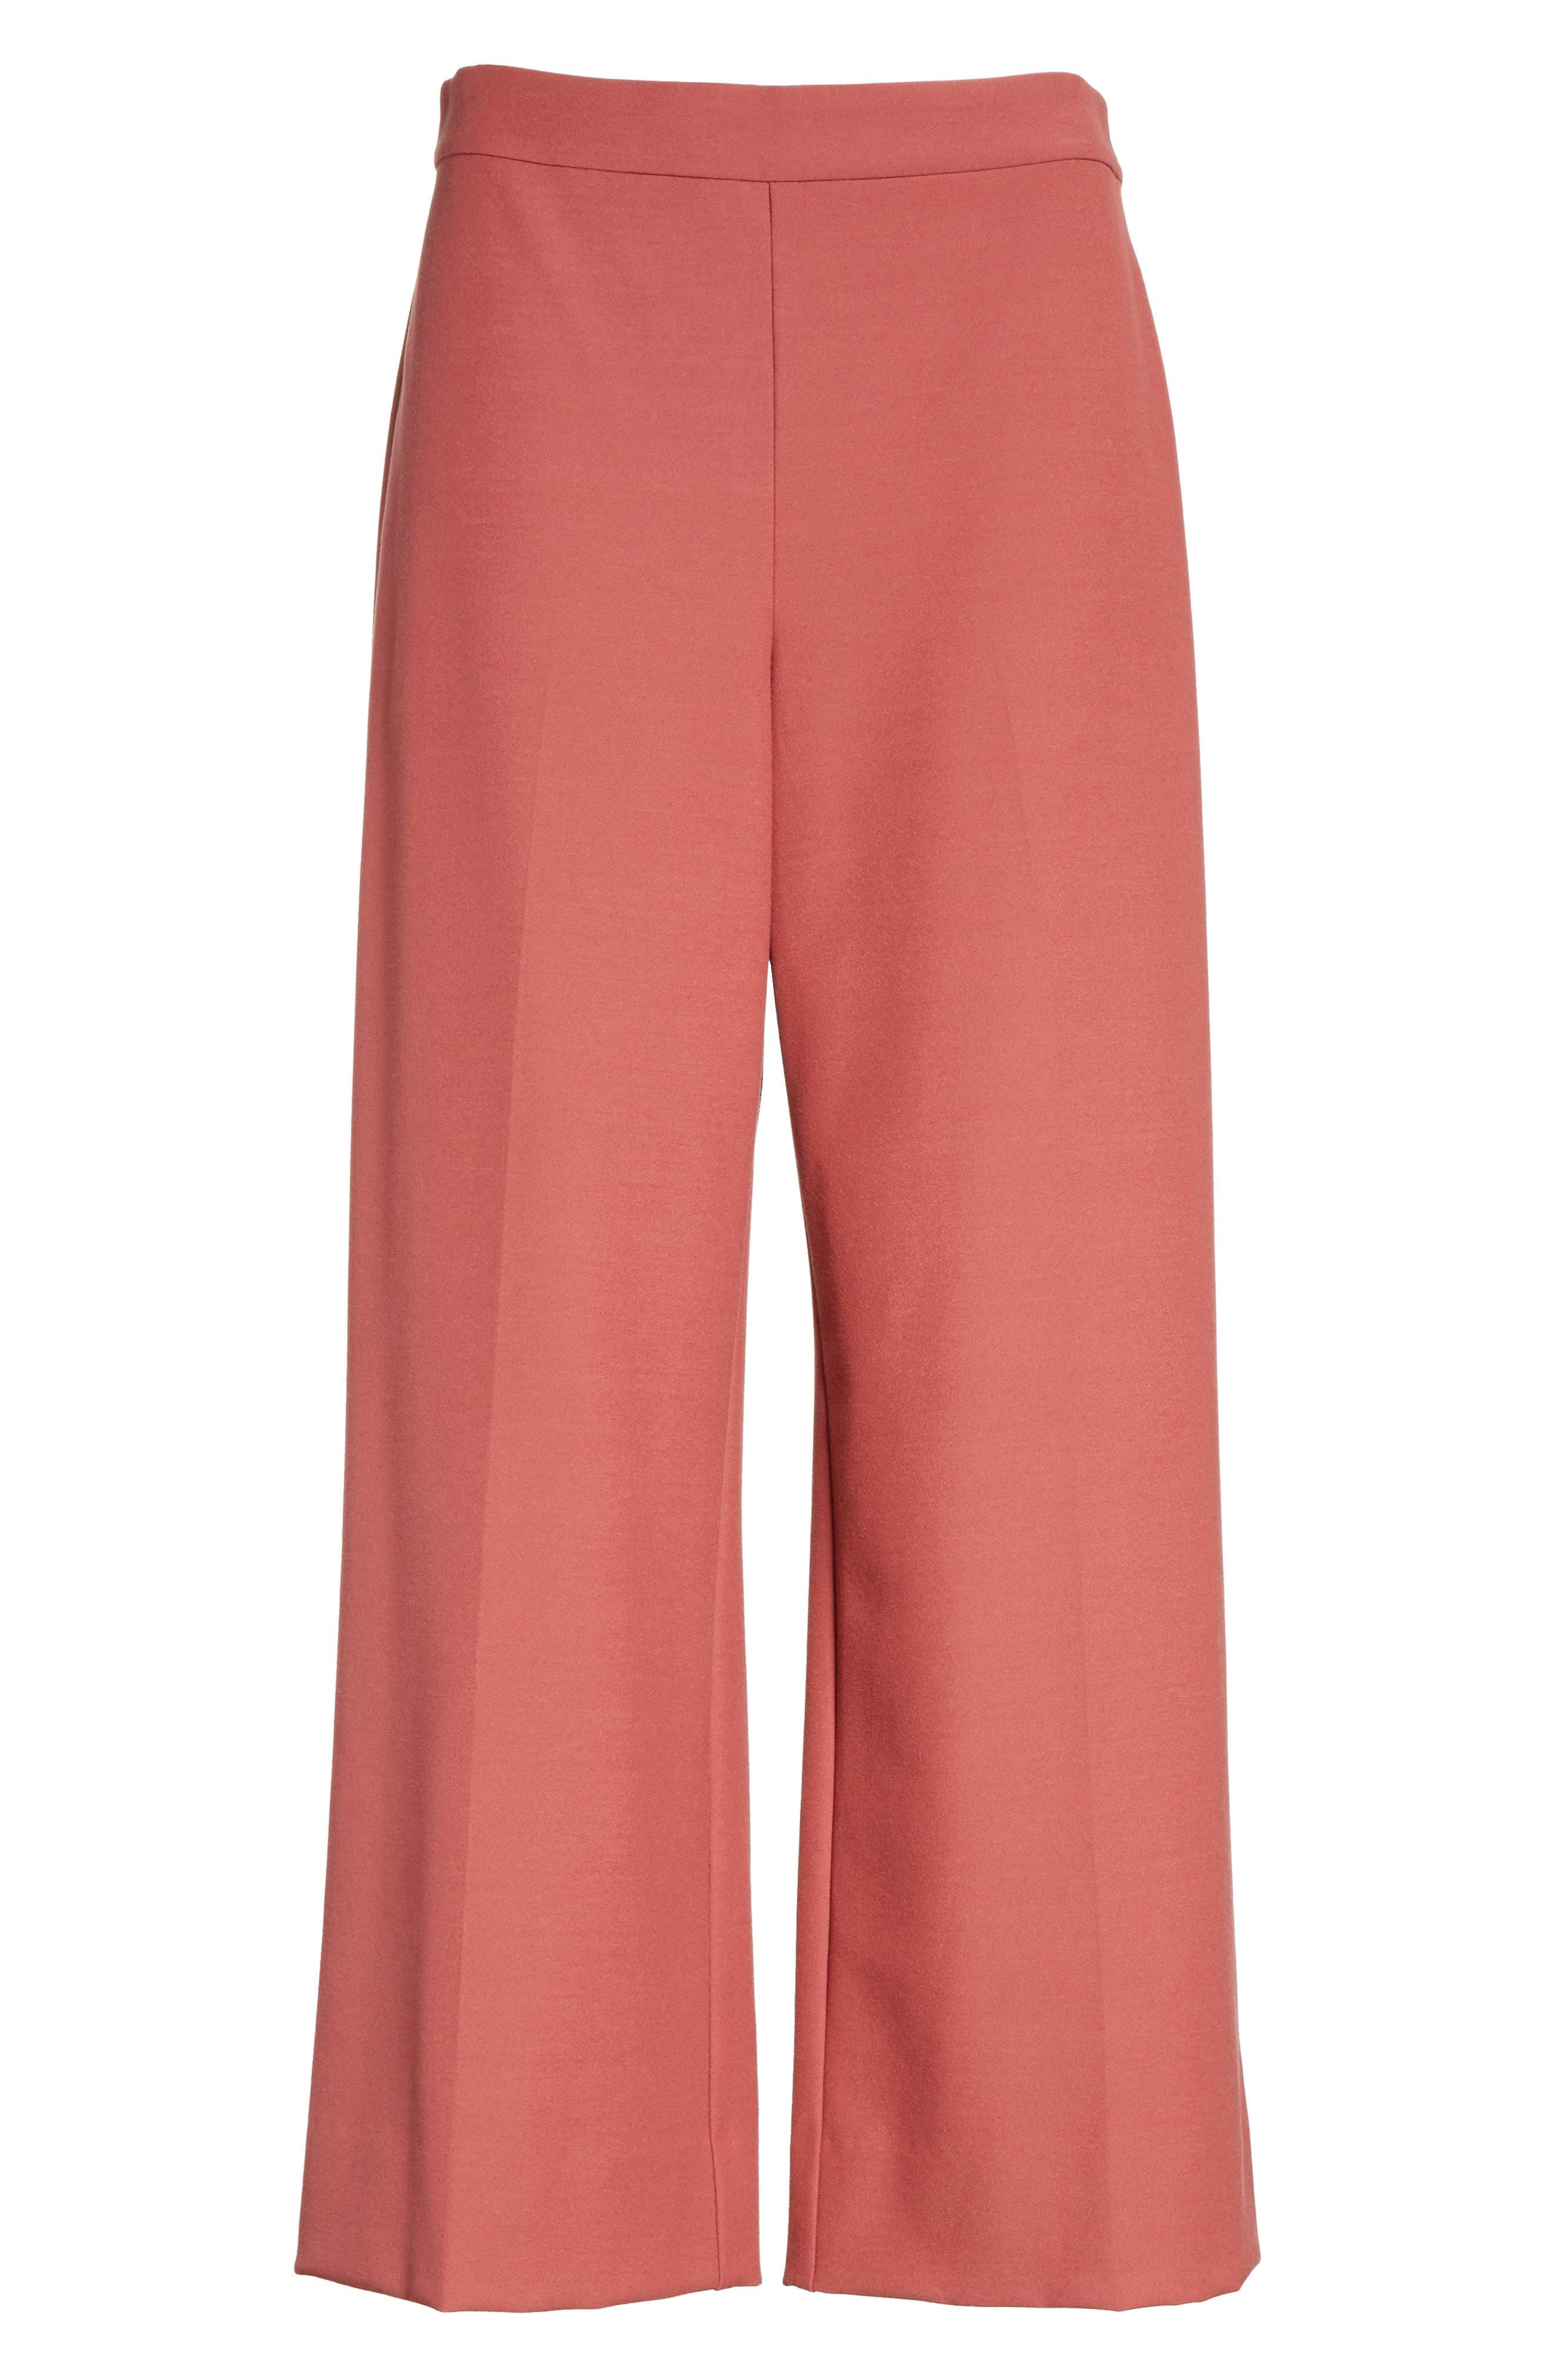 Stretch Suiting Crop Pants,                             Alternate thumbnail 6, color,                             950